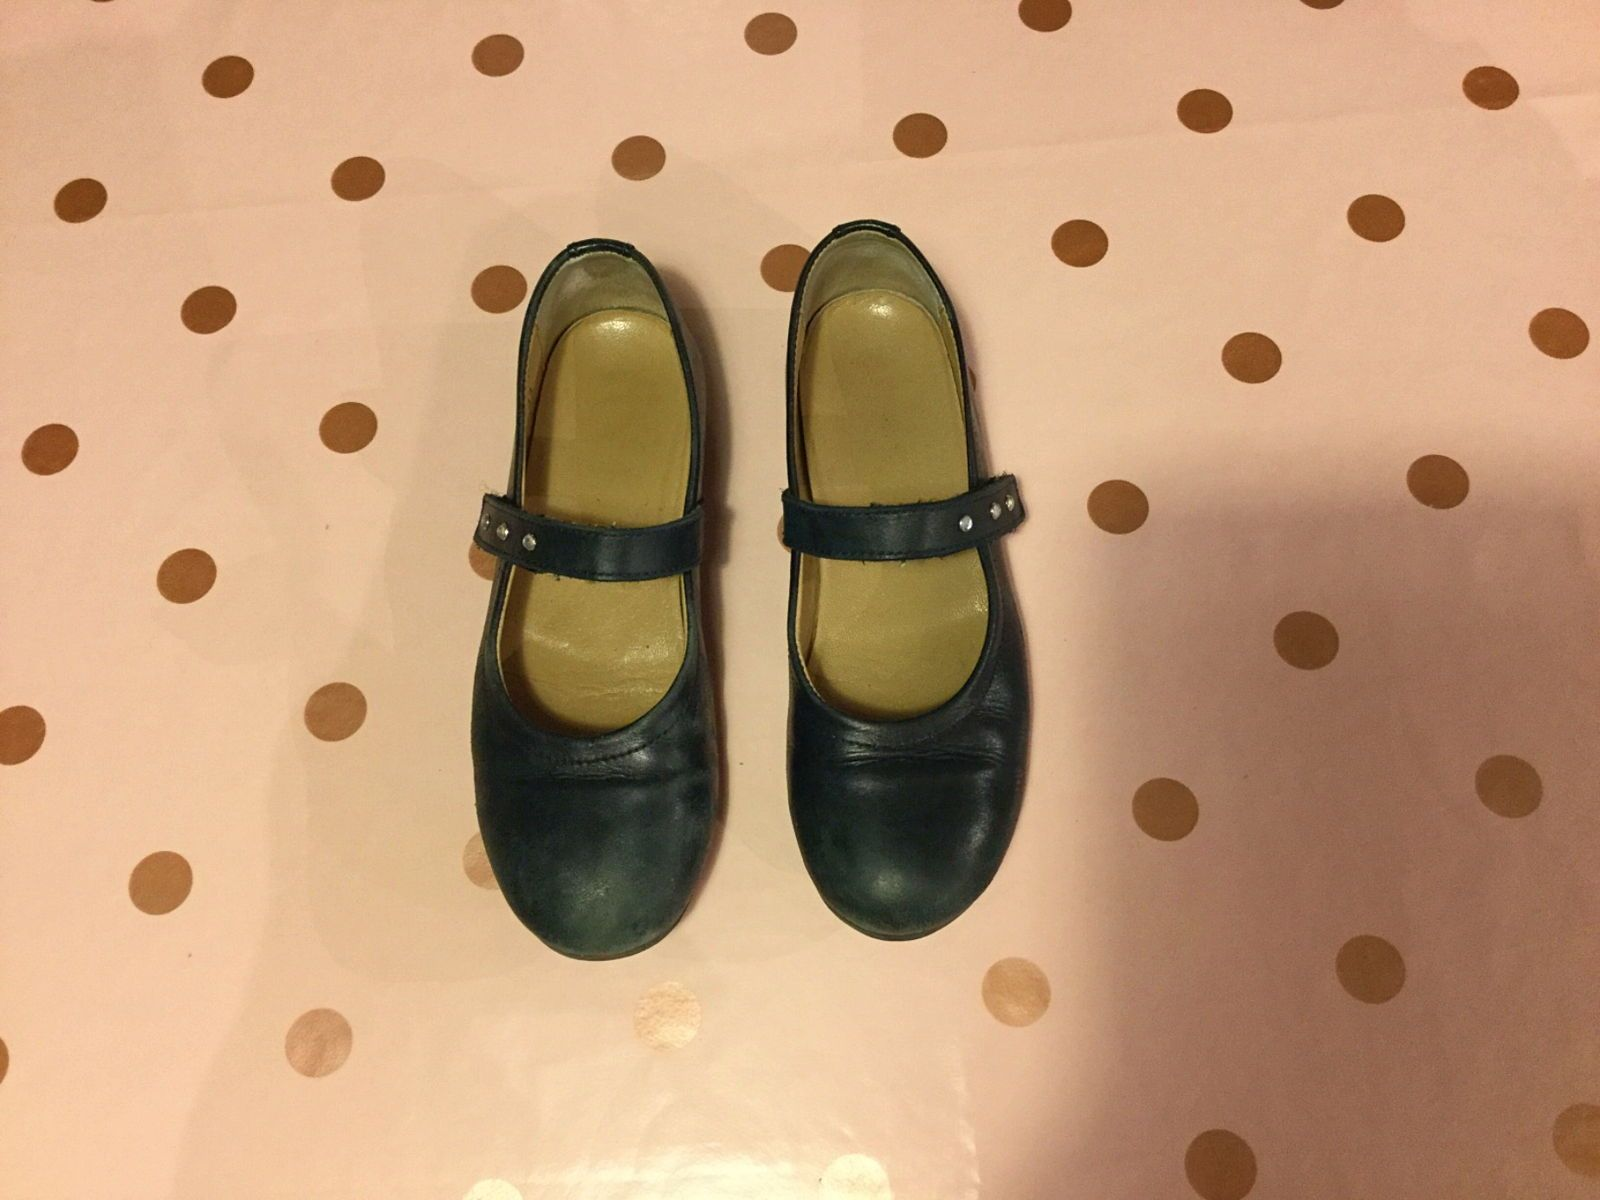 Chaussures en cuir bleu marine pointure 33